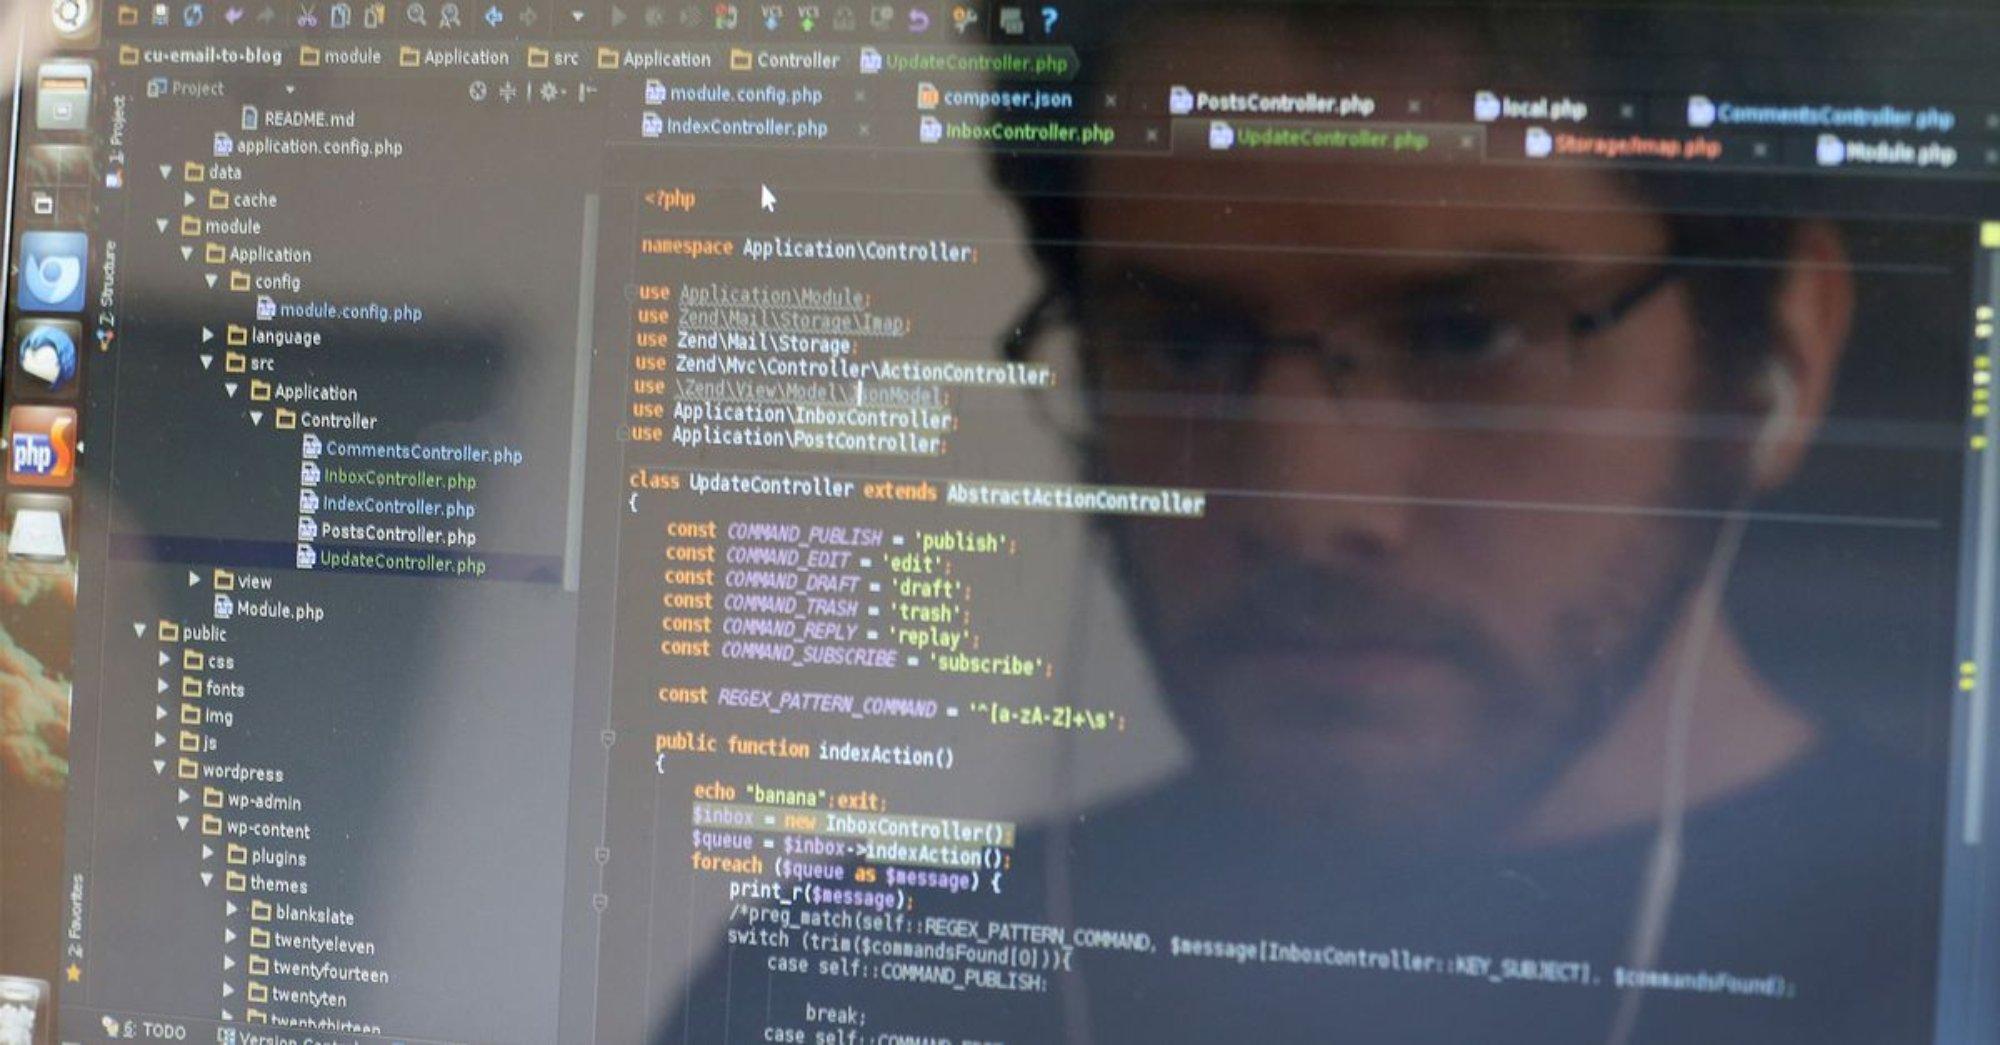 Beyond ASP.NET MVC: Modern Web Development Demystified